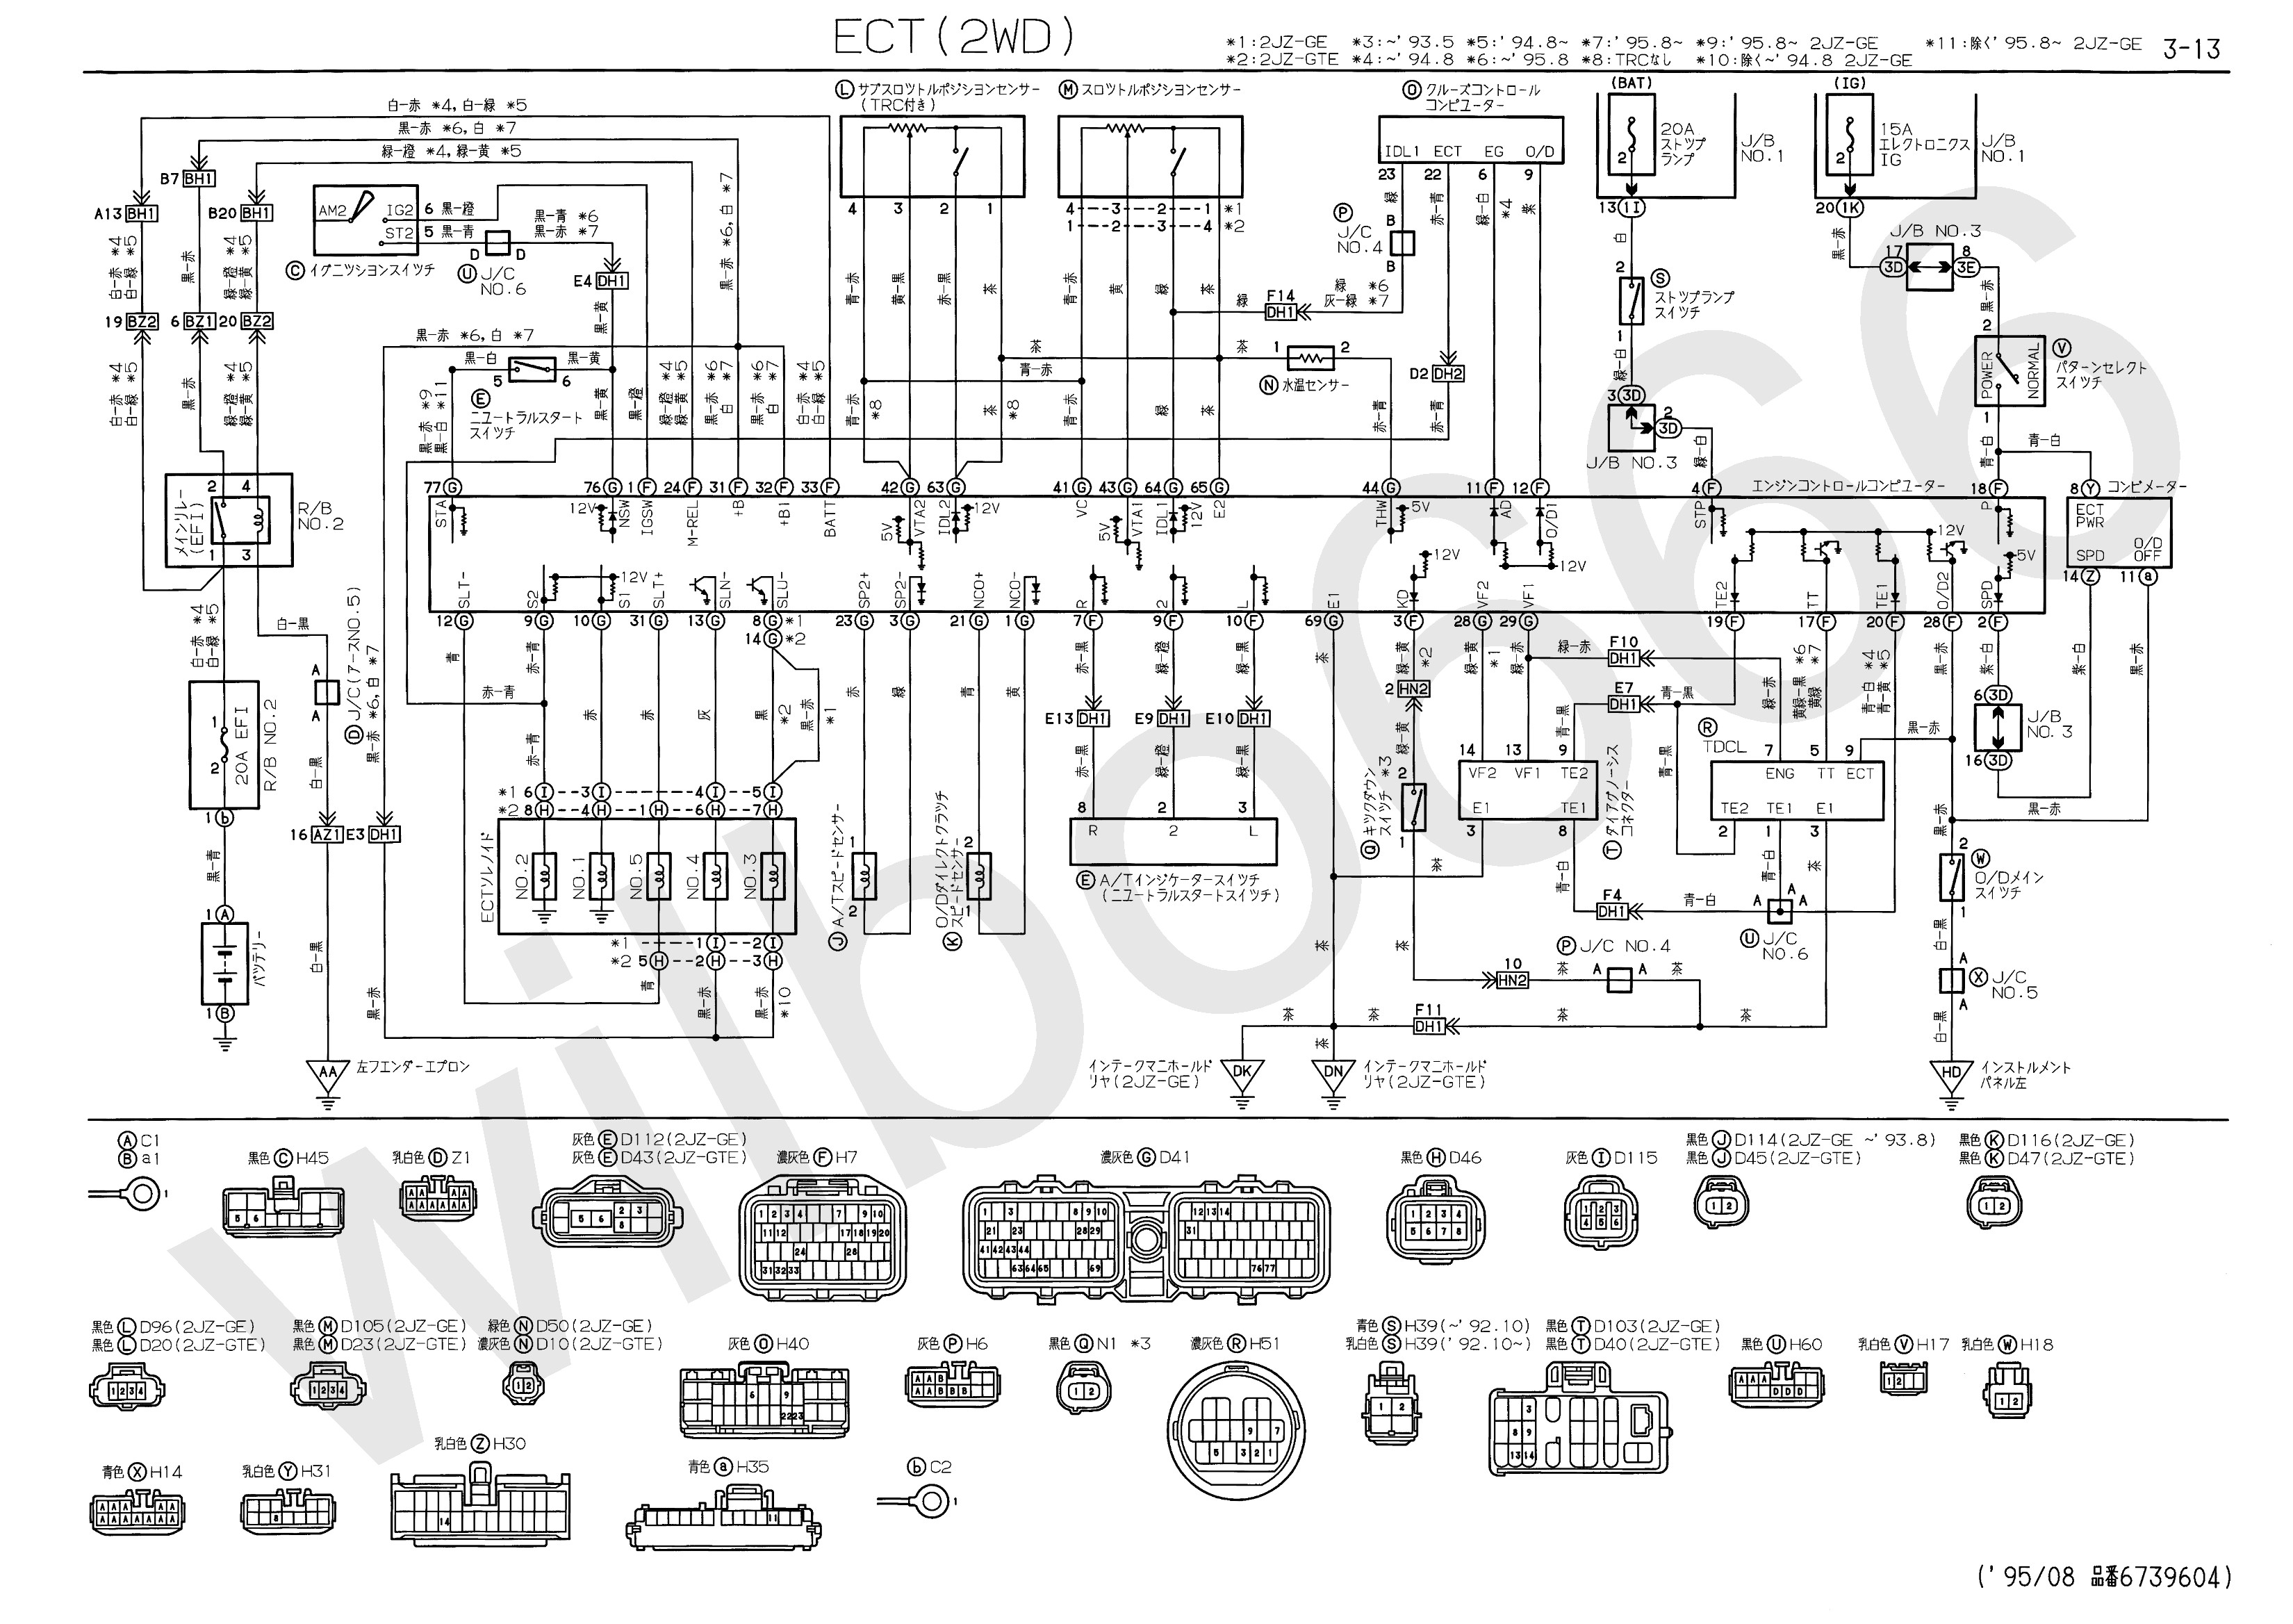 Car Engine Management System Block Diagram Wilbo666 2jz Gte Jzs147 ...